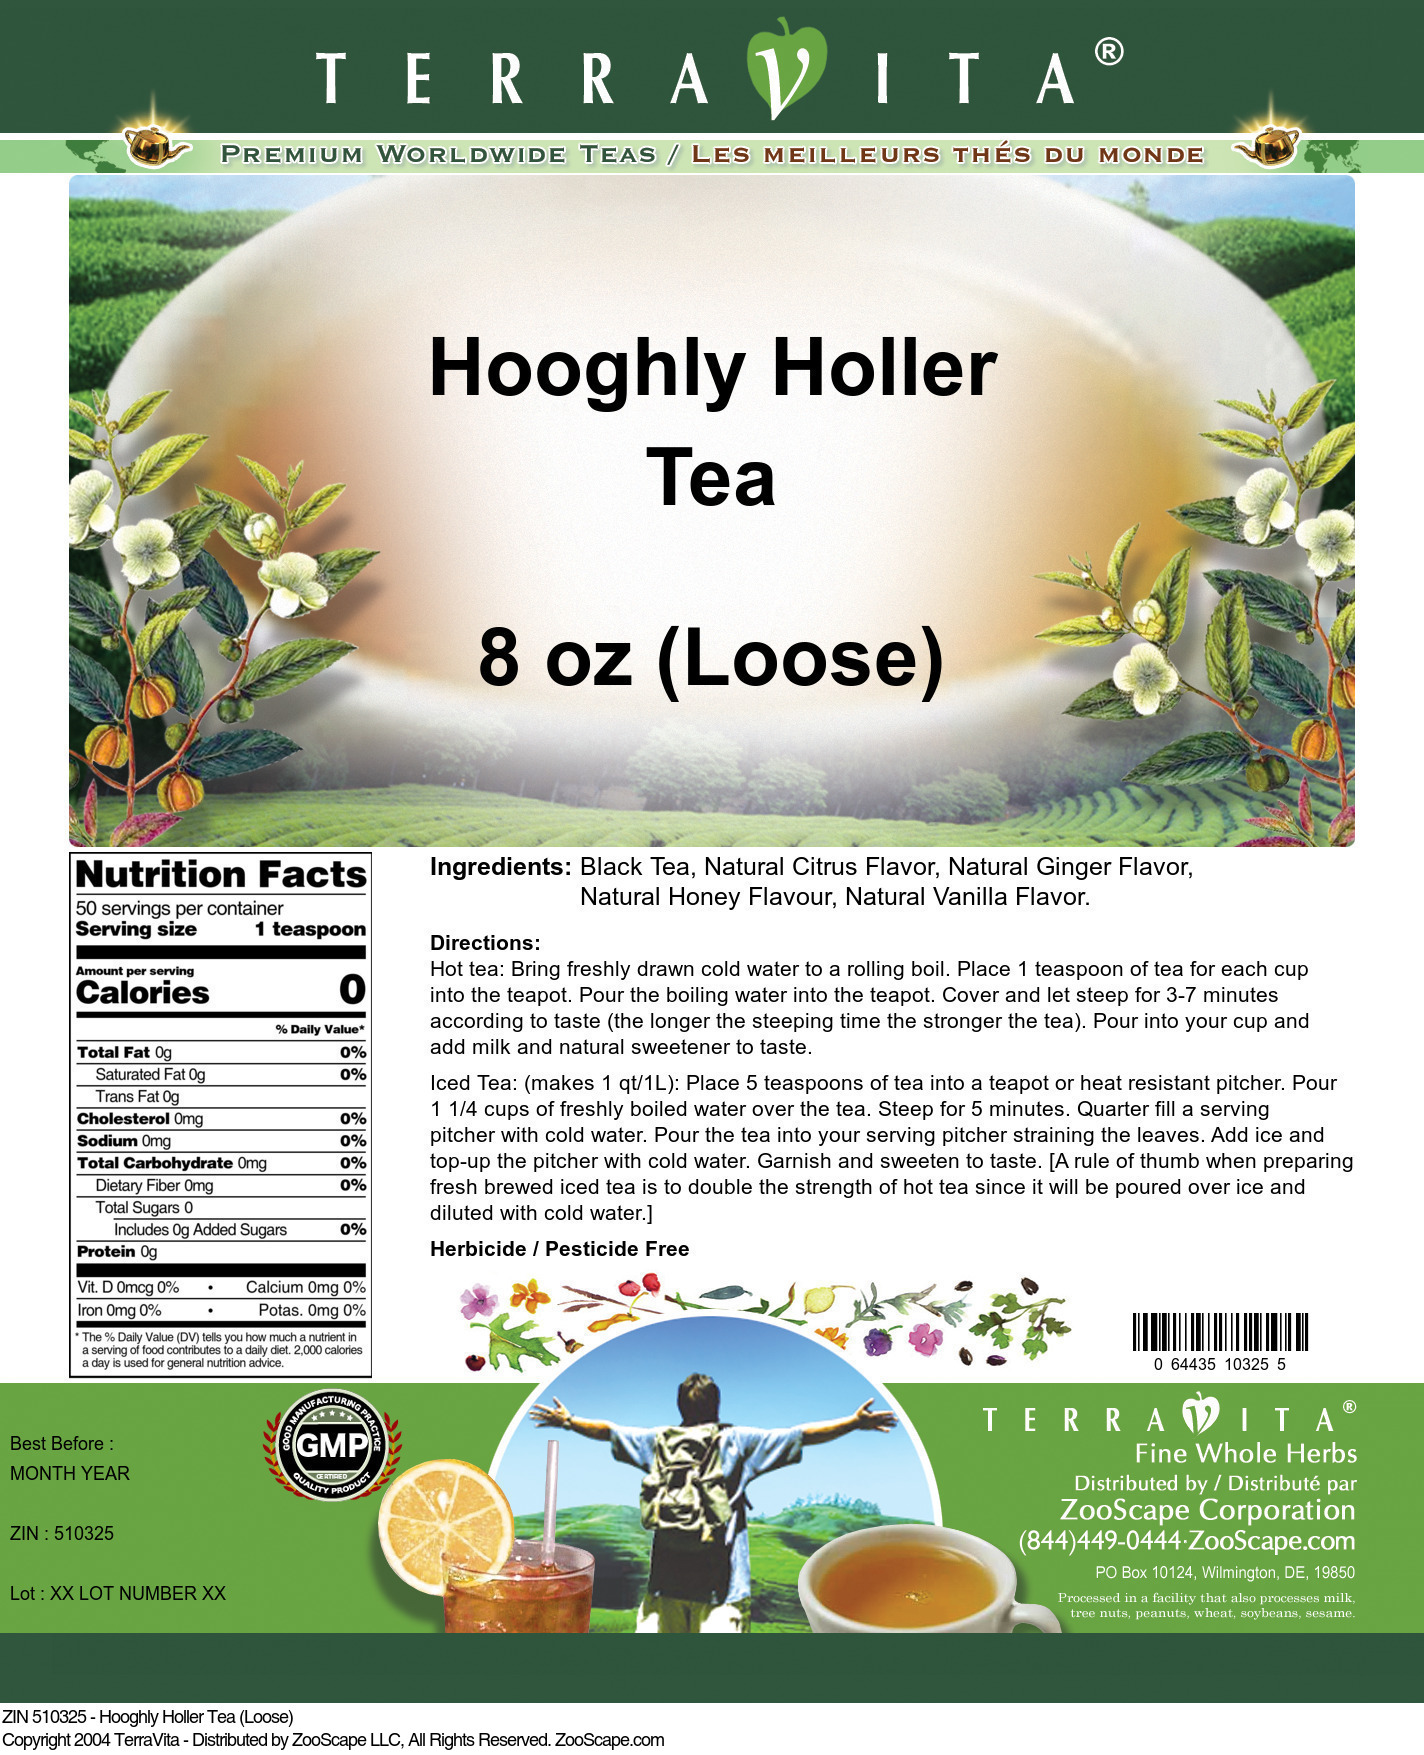 Hooghly Holler